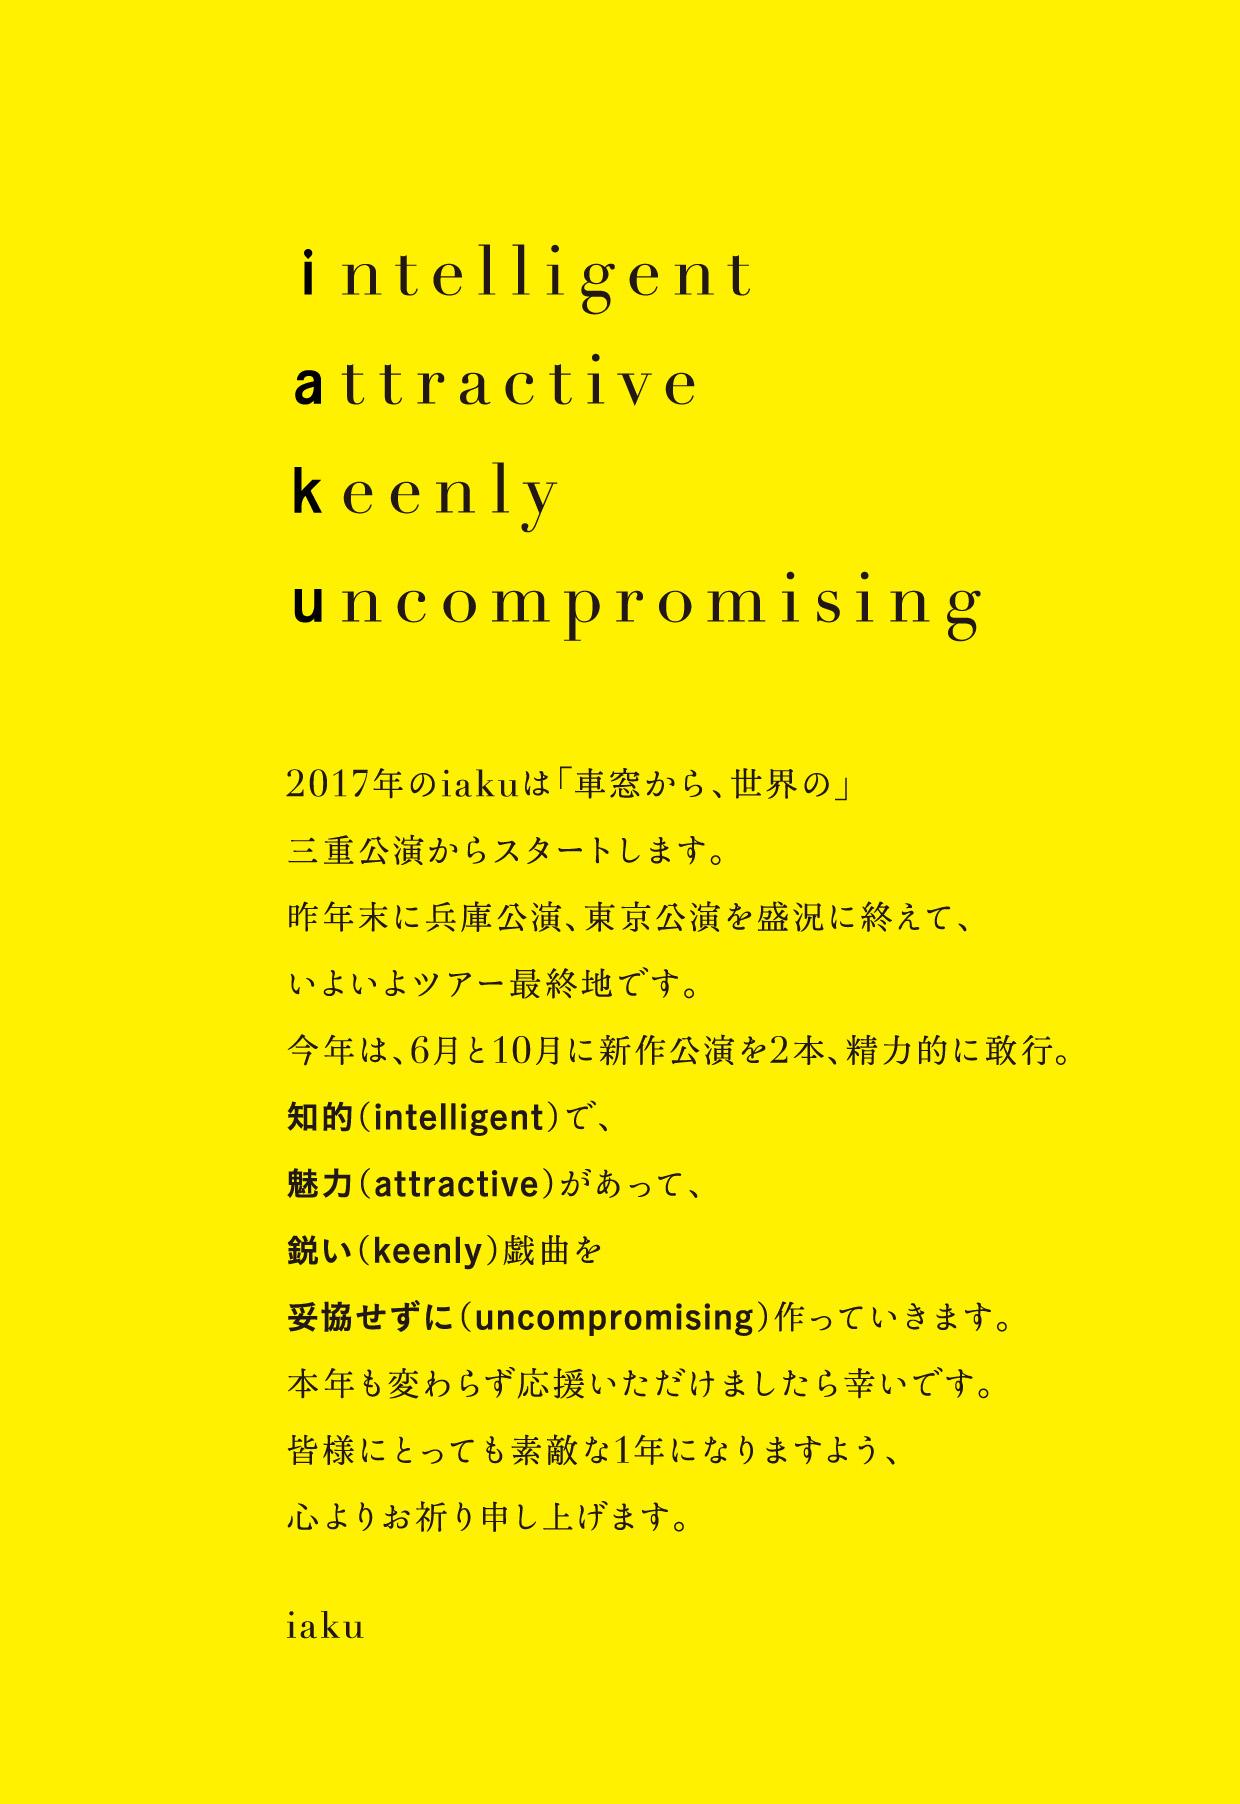 http://www.yokoyama-iaku.com/iaku_1221_.jpeg